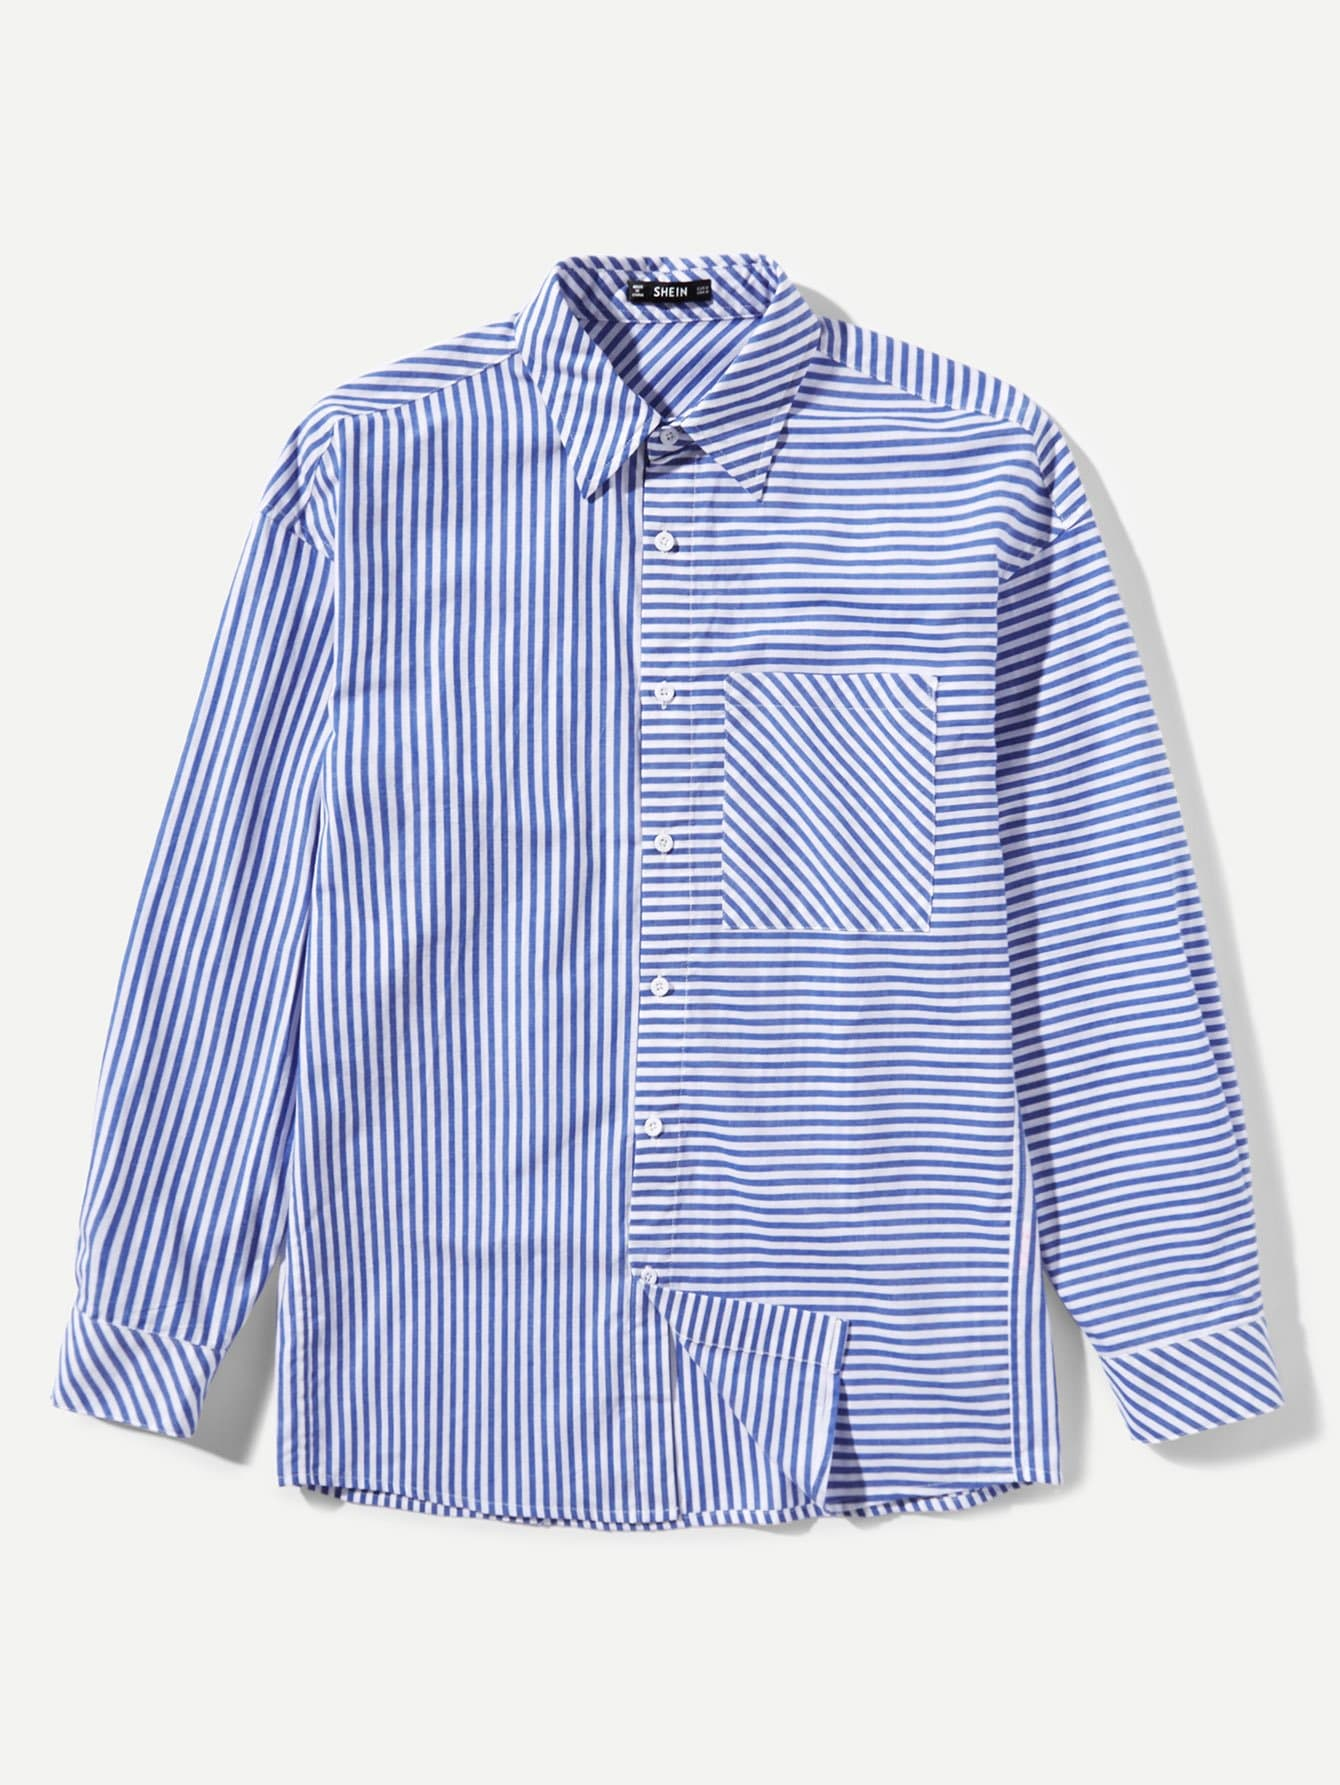 Купить Мужская полосатая карманная рубашка, null, SheIn